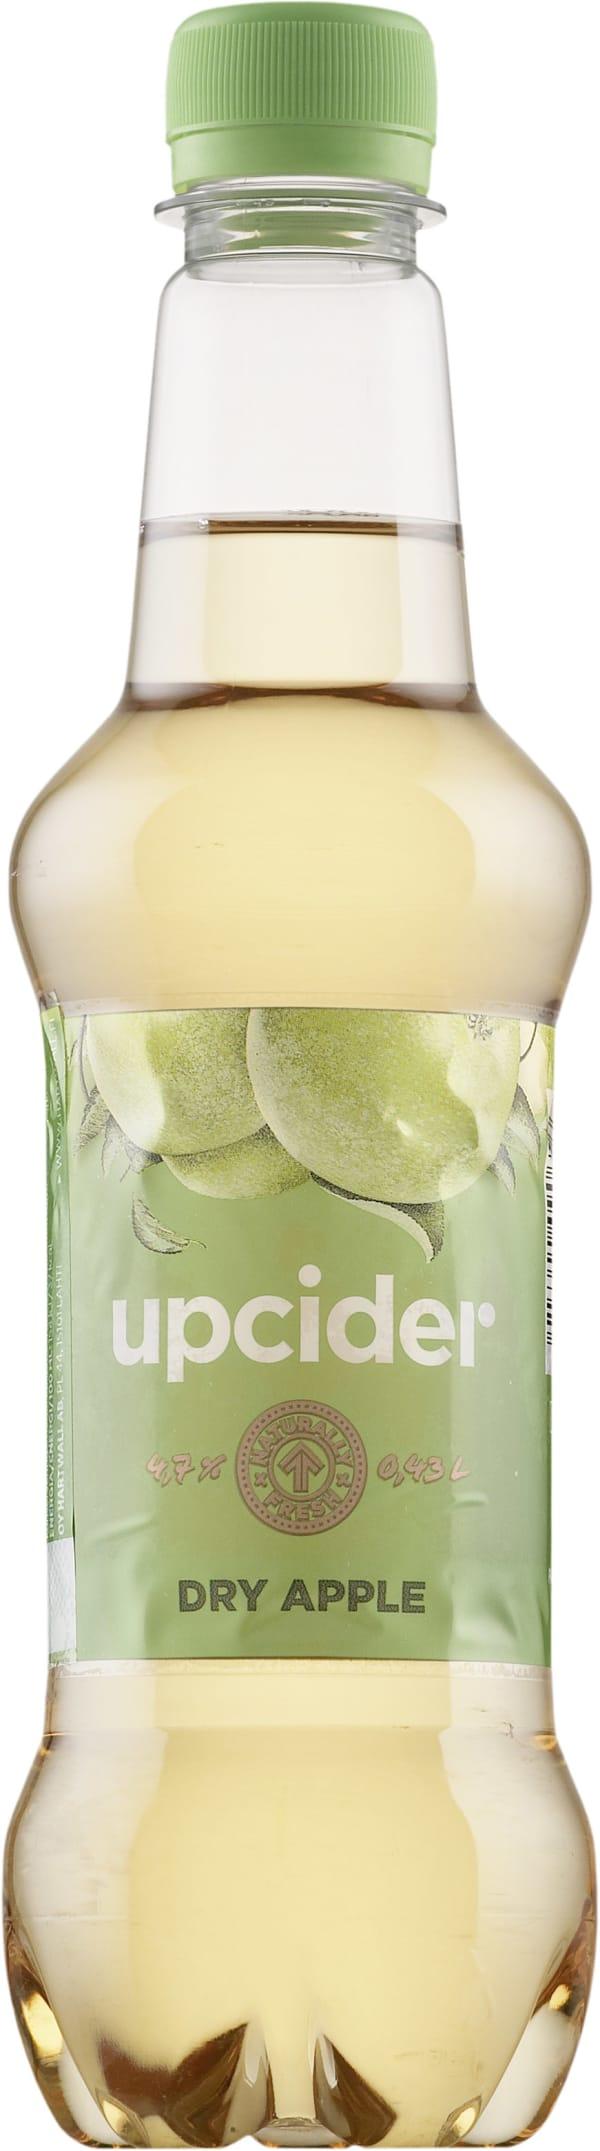 Upcider Dry Apple  muovipullo